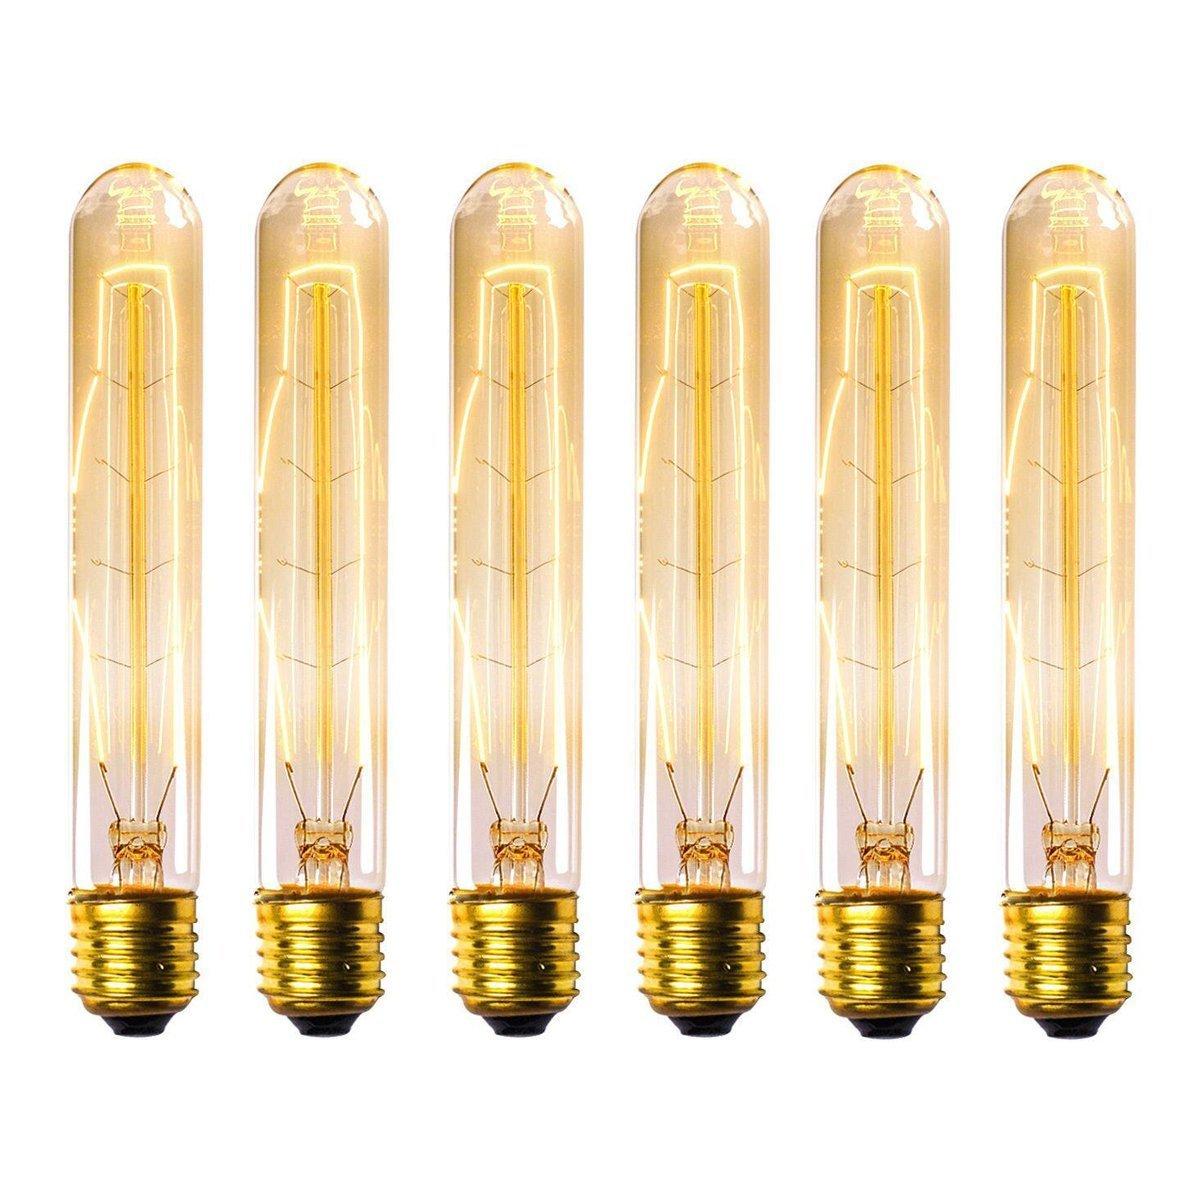 Tubular Edison Bulbs, KINGSO Dimmable Vintage Light Bulbs 60W Nostalgic Filament Incandescent Antique Light Bulb E27 Base T30 110V Length of 7.28 inches - 6 Pack